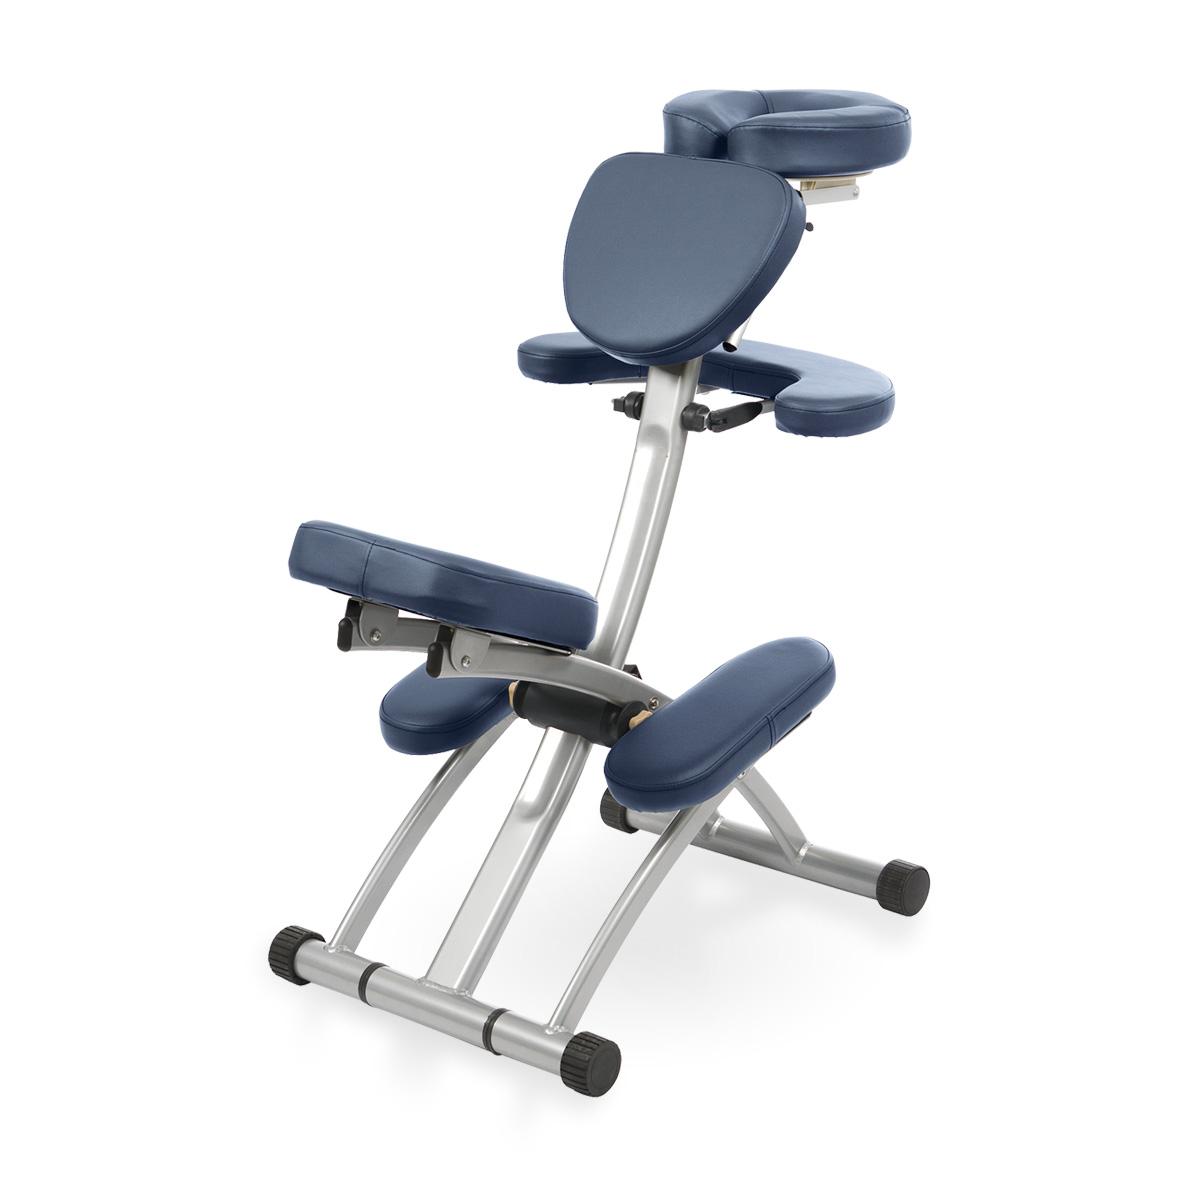 Chaise de massage ERGO - Bleu marine - Reconditionnée